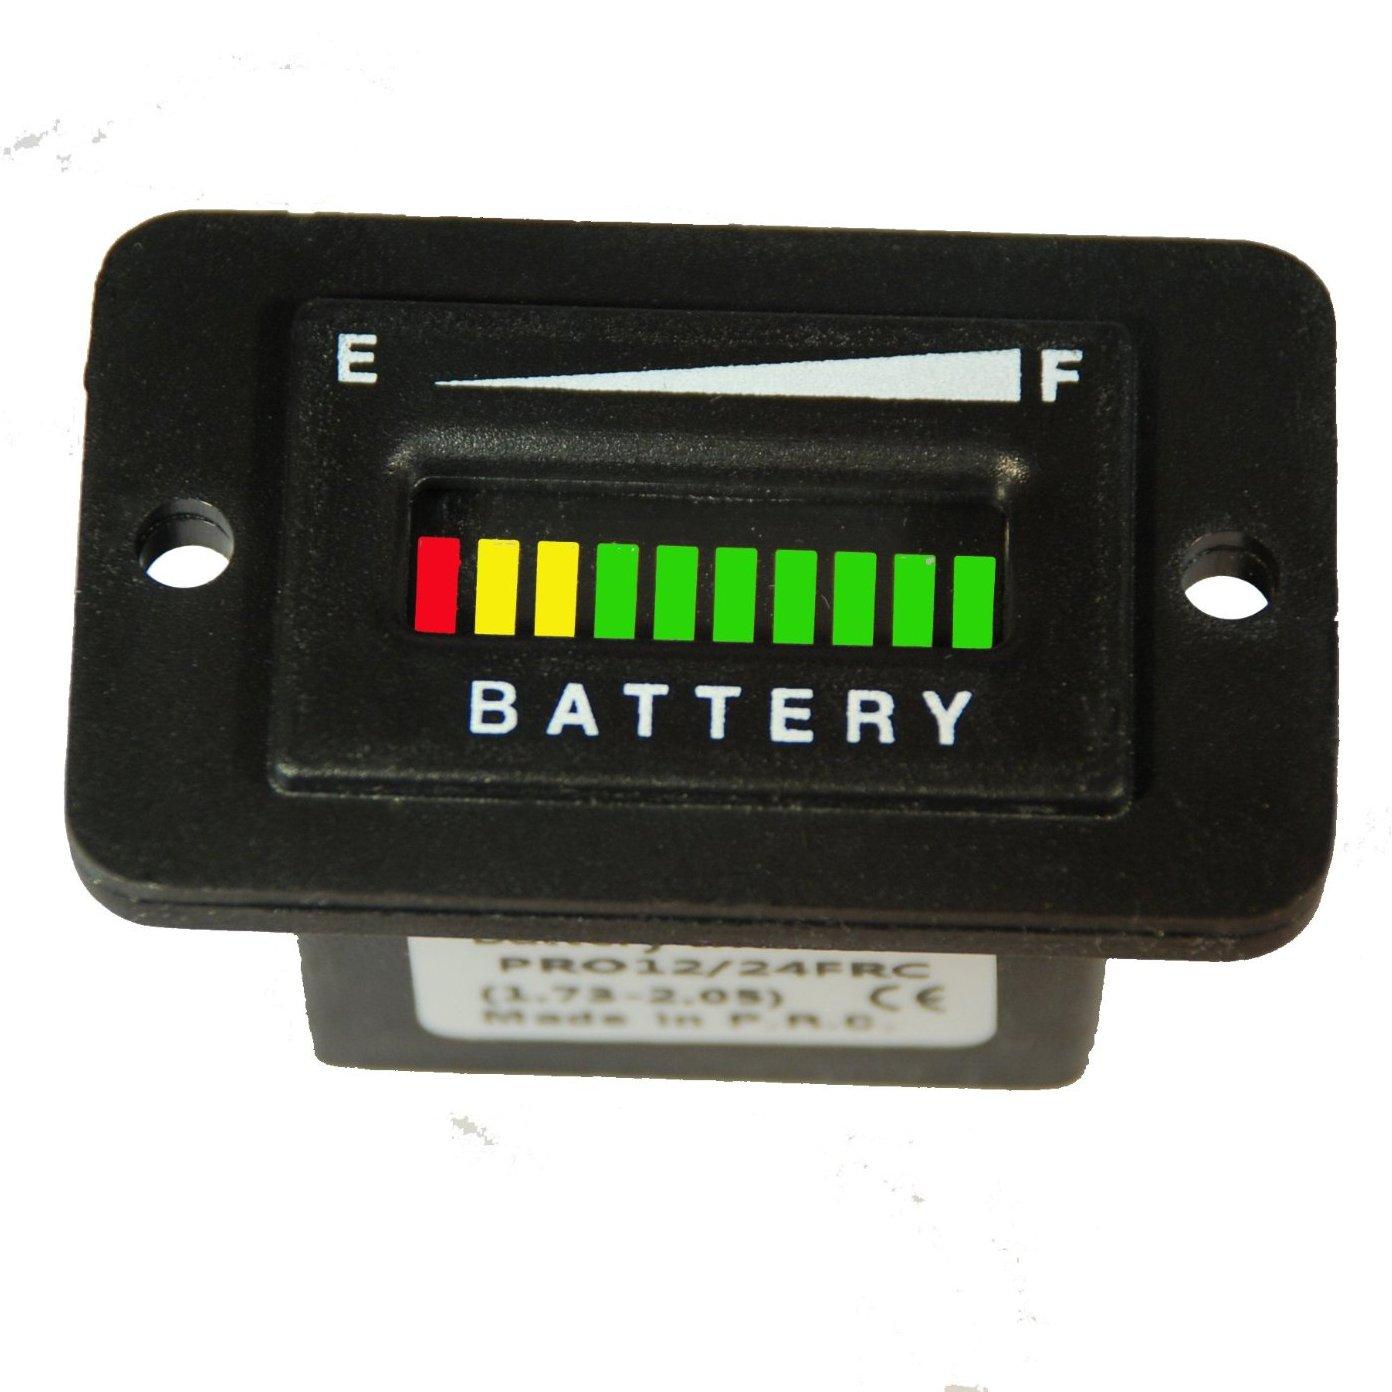 GEREE 12V Lithium Battery Capacity Tester Meter Display Panel Electric power Indicator Board